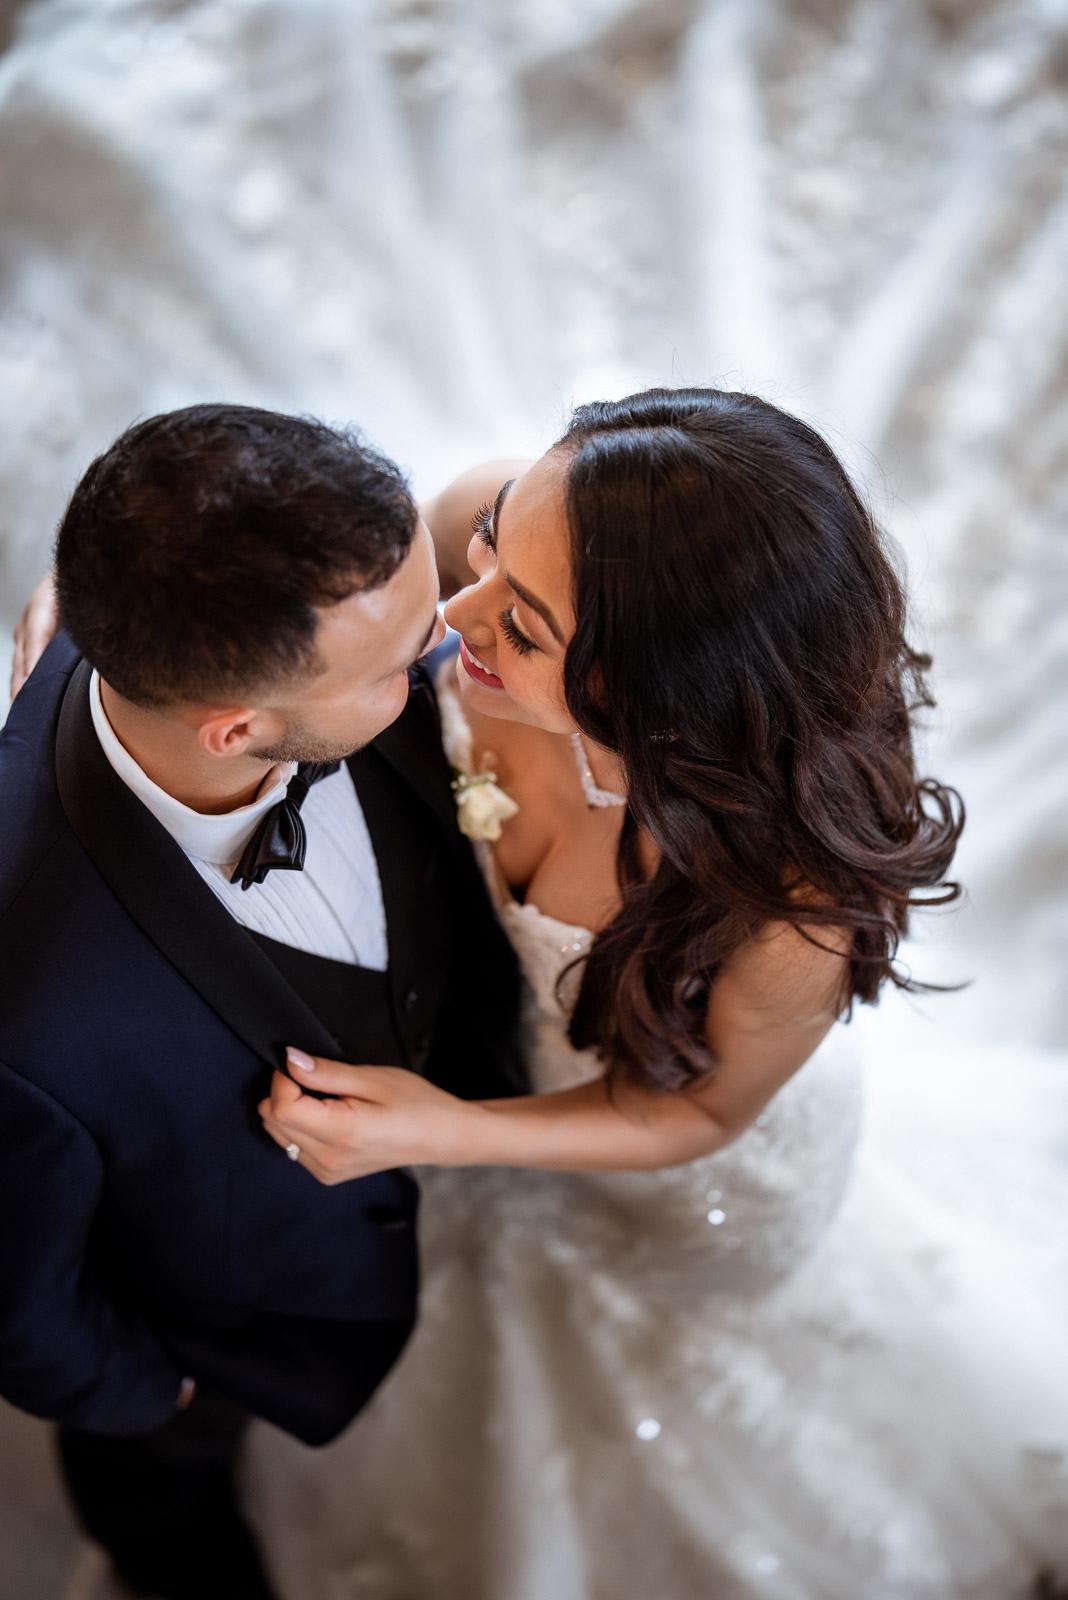 Unique and Elegant Wedding Photos | Josie V Photography